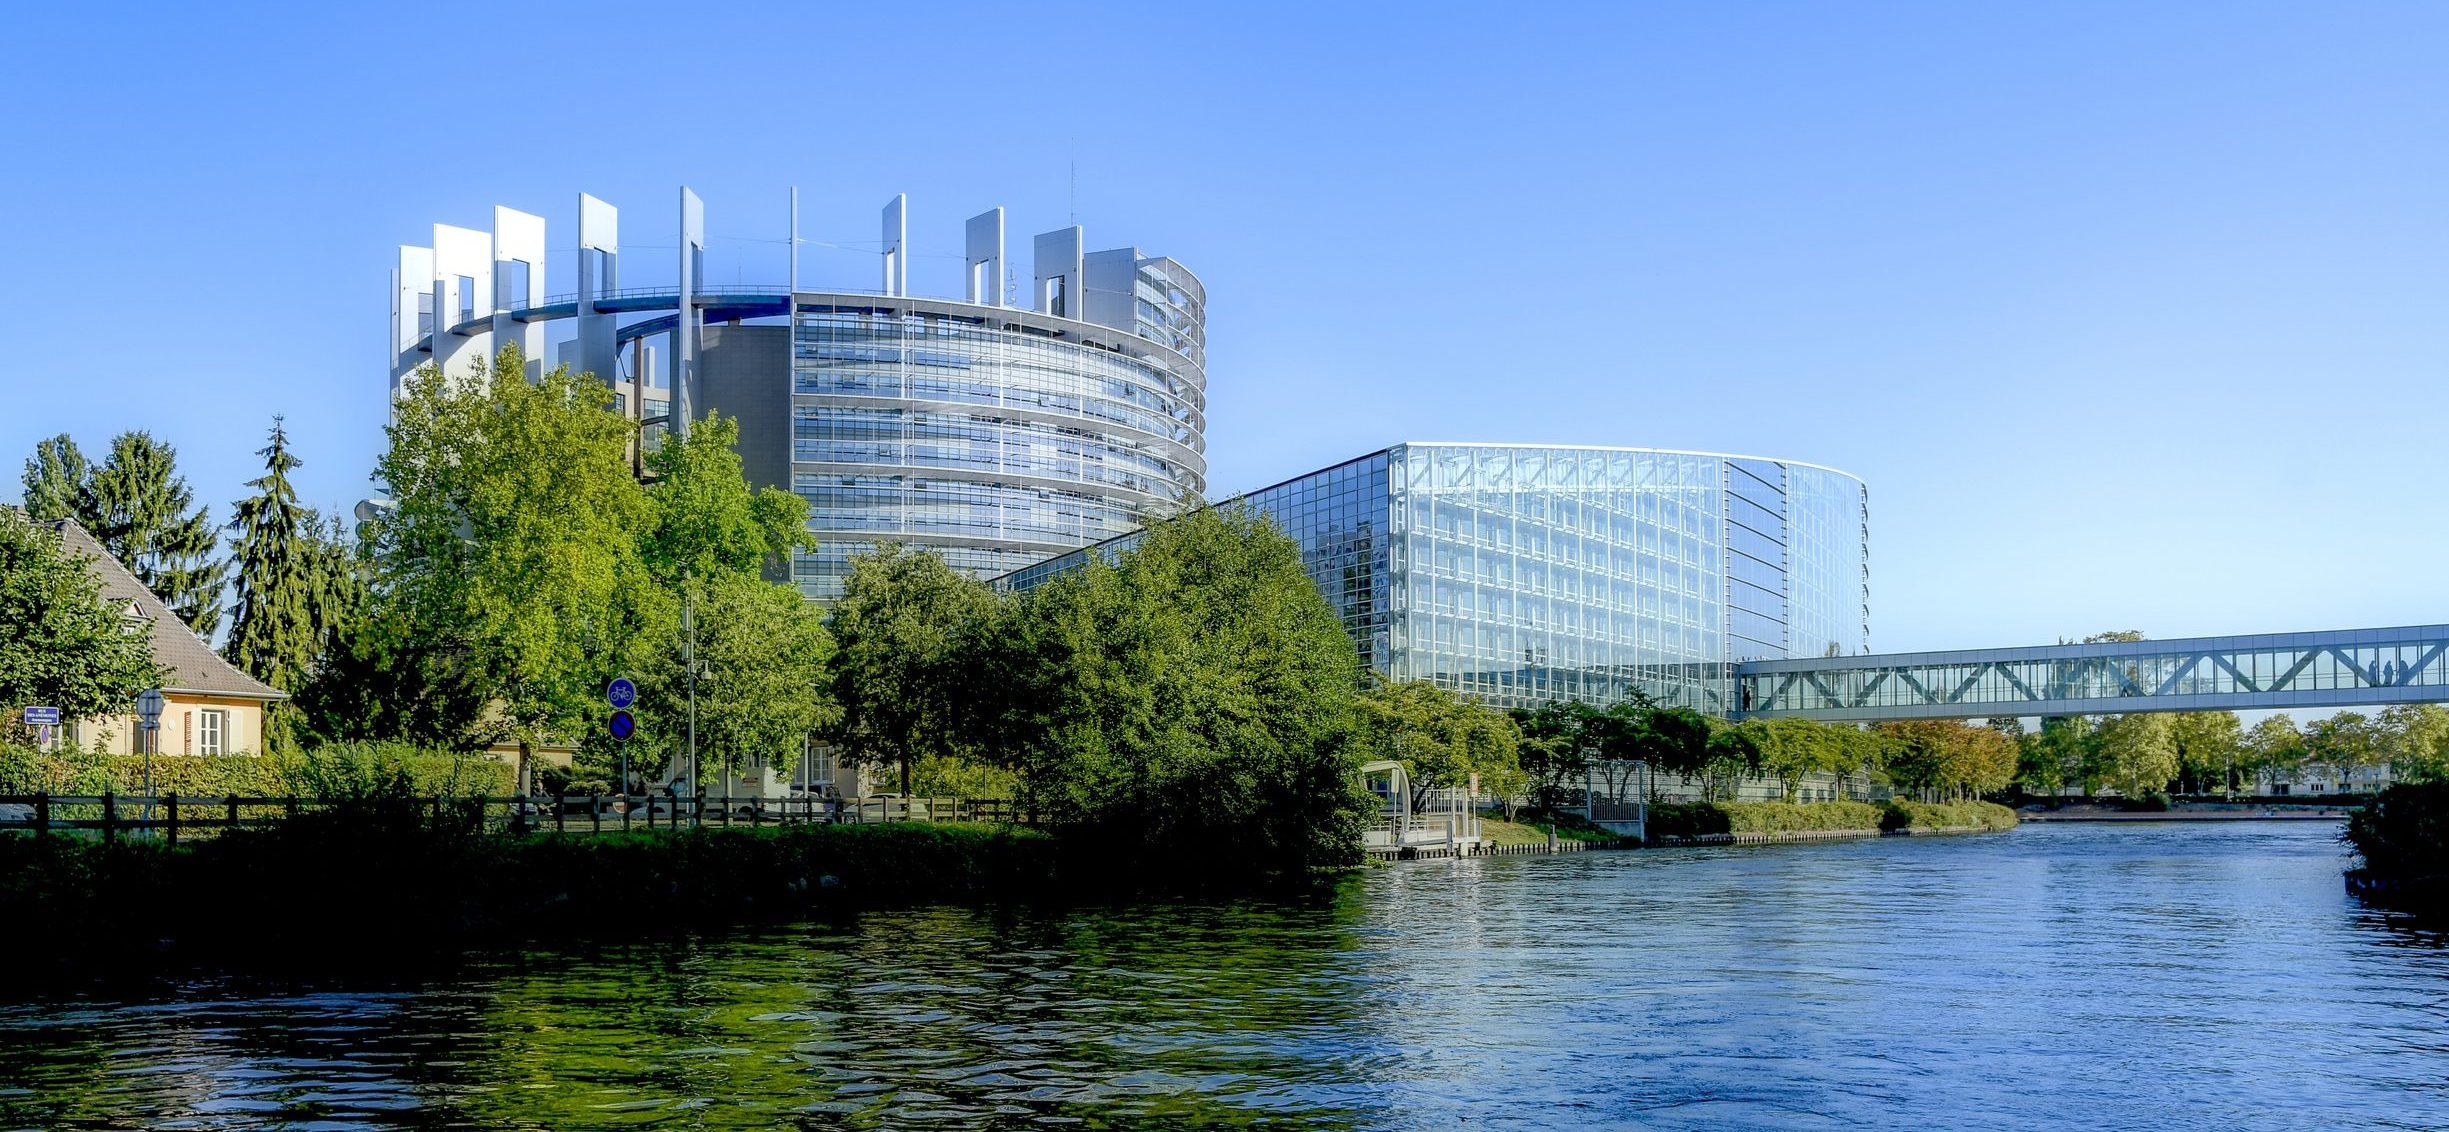 European Parliament building in Strasbourg